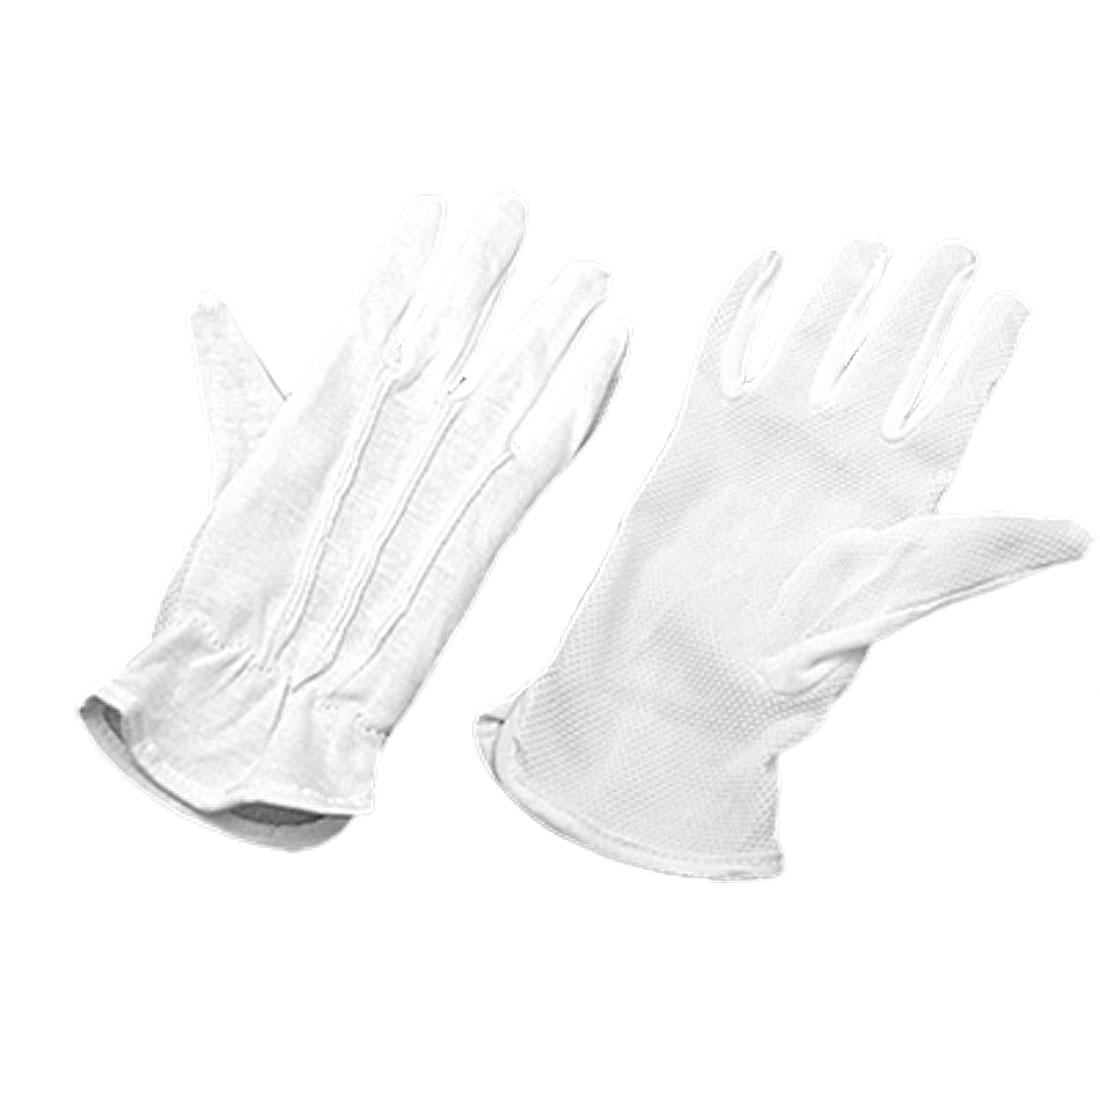 Pair Protective Anti-Slip White Cotton Work Driving Gloves